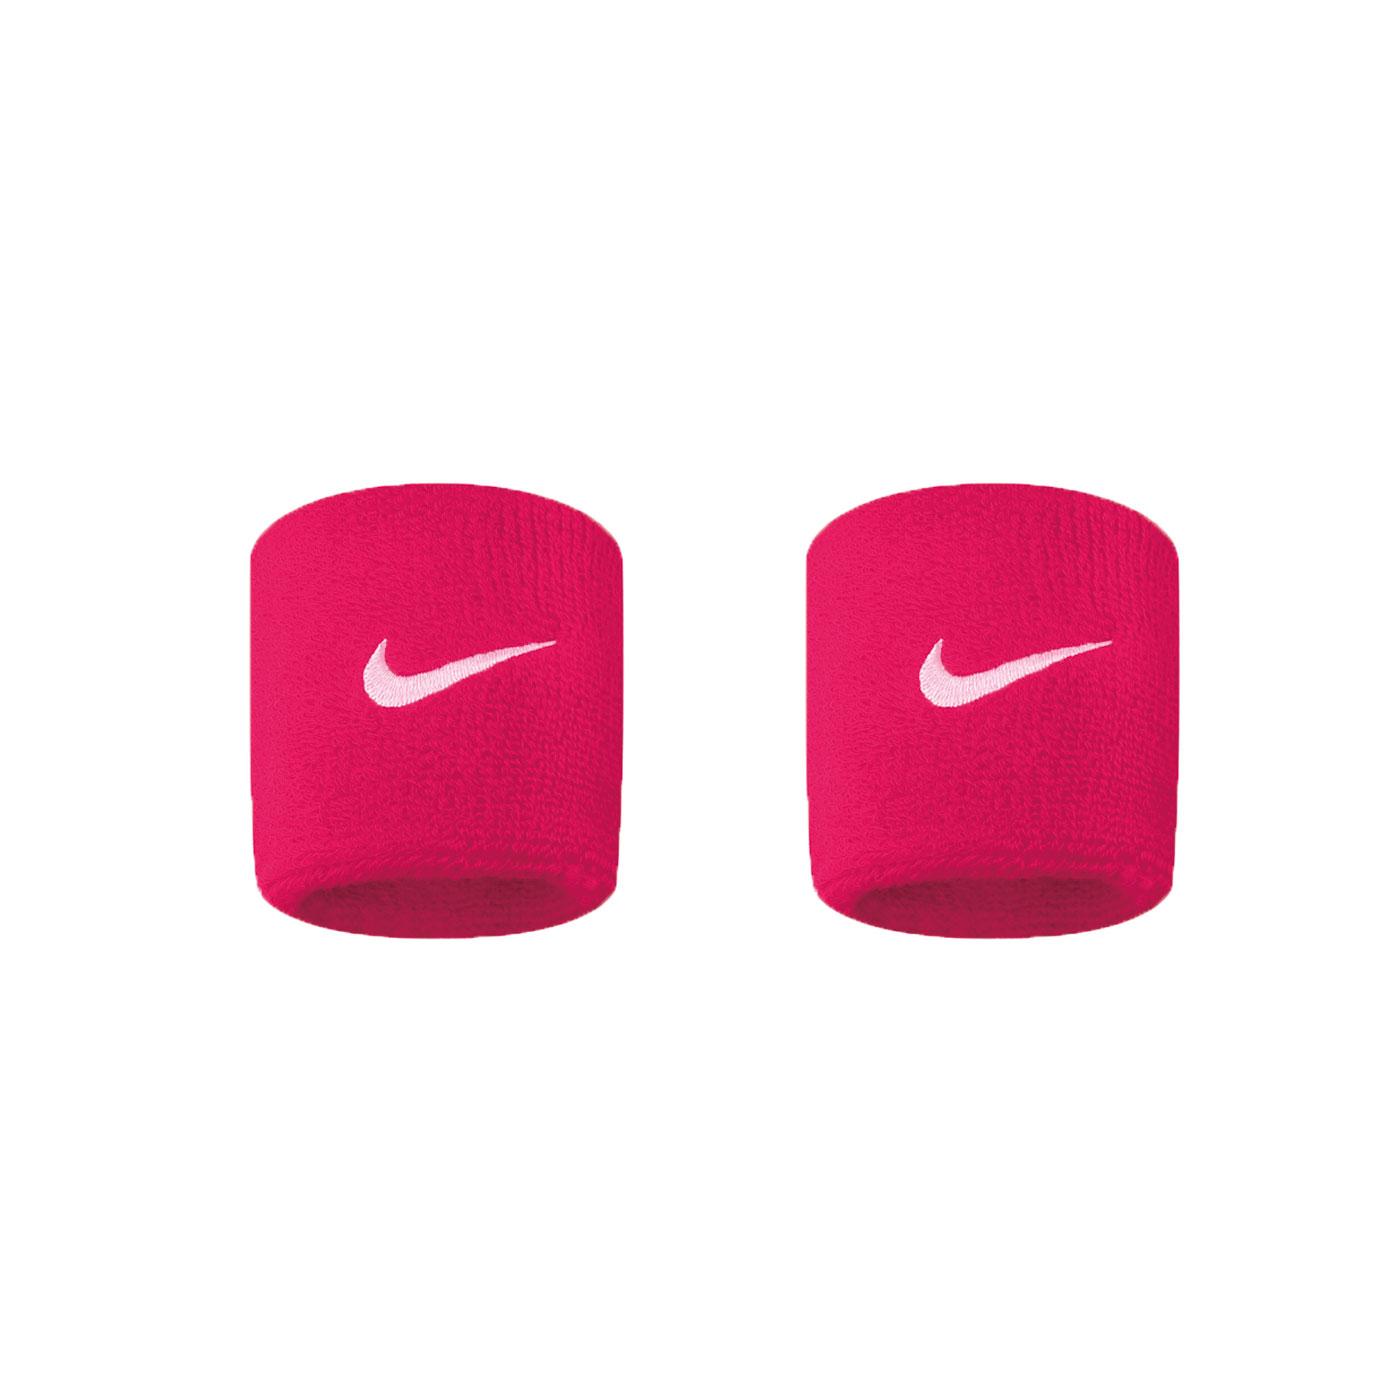 NIKE SwooSh 單色腕帶(慢跑 路跑 籃球 網球 羽球 一雙入【98341120】≡排汗專家≡